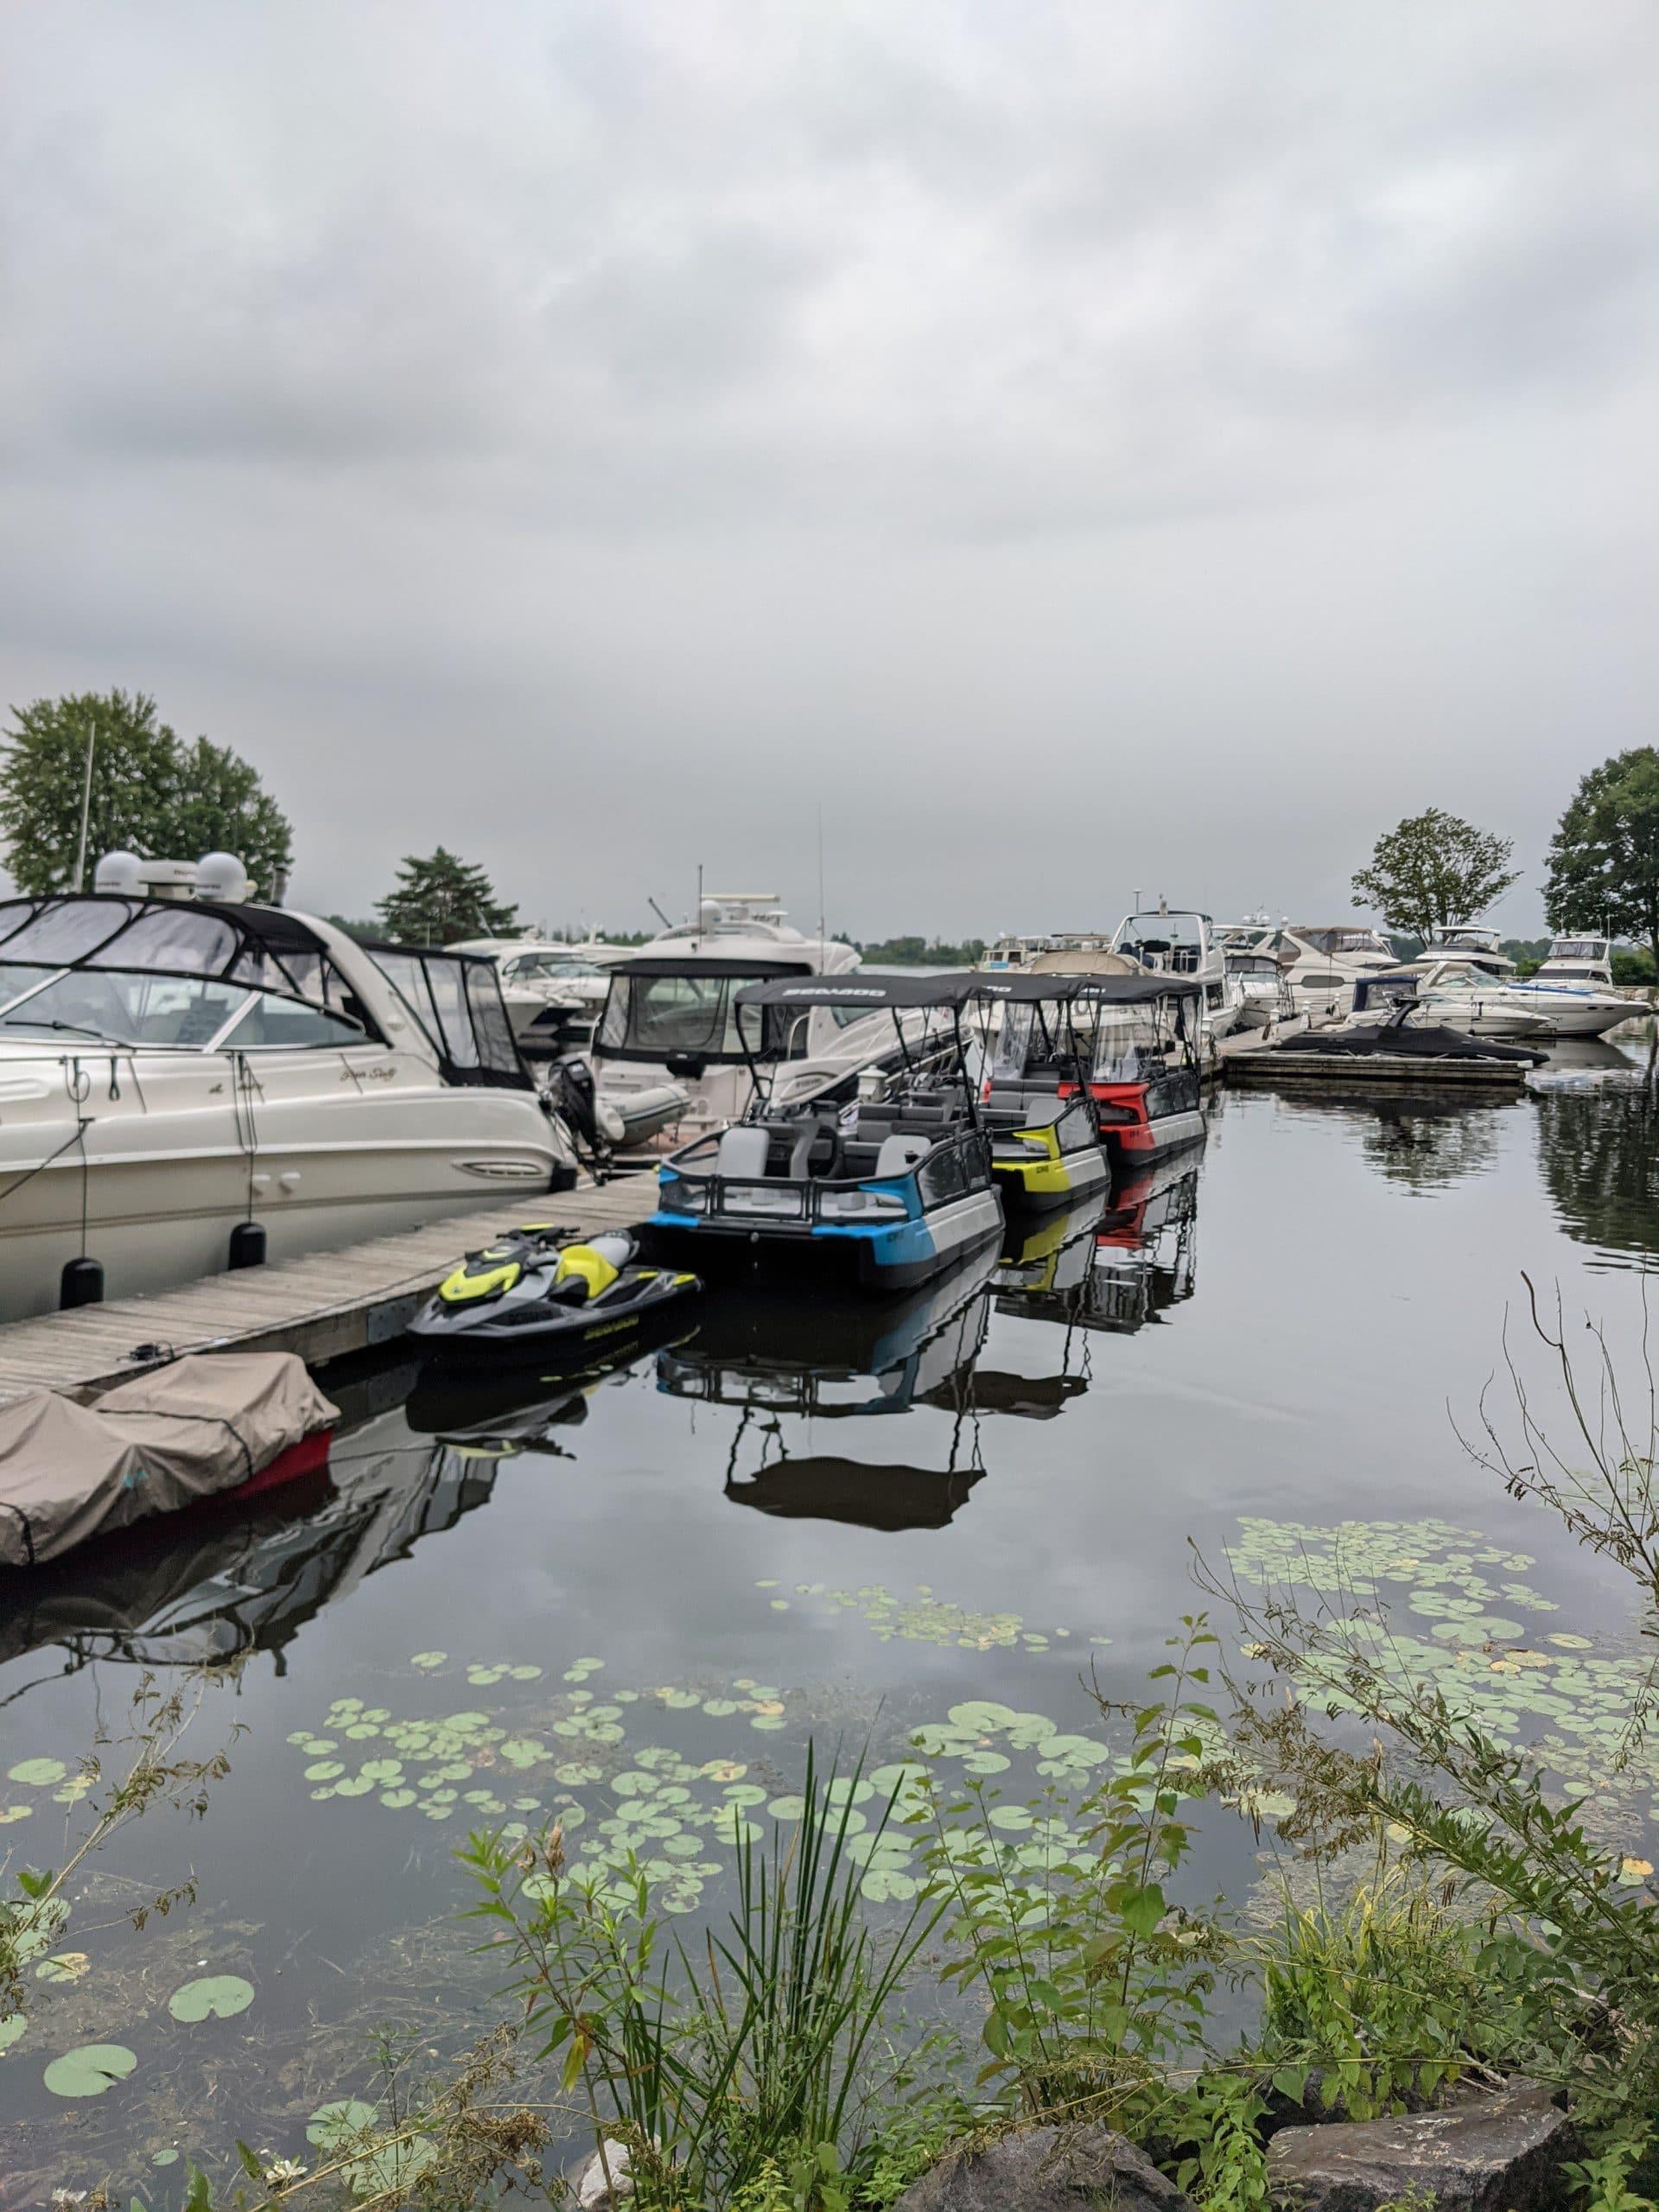 The 2022 Sea-Doo Switch pontoon